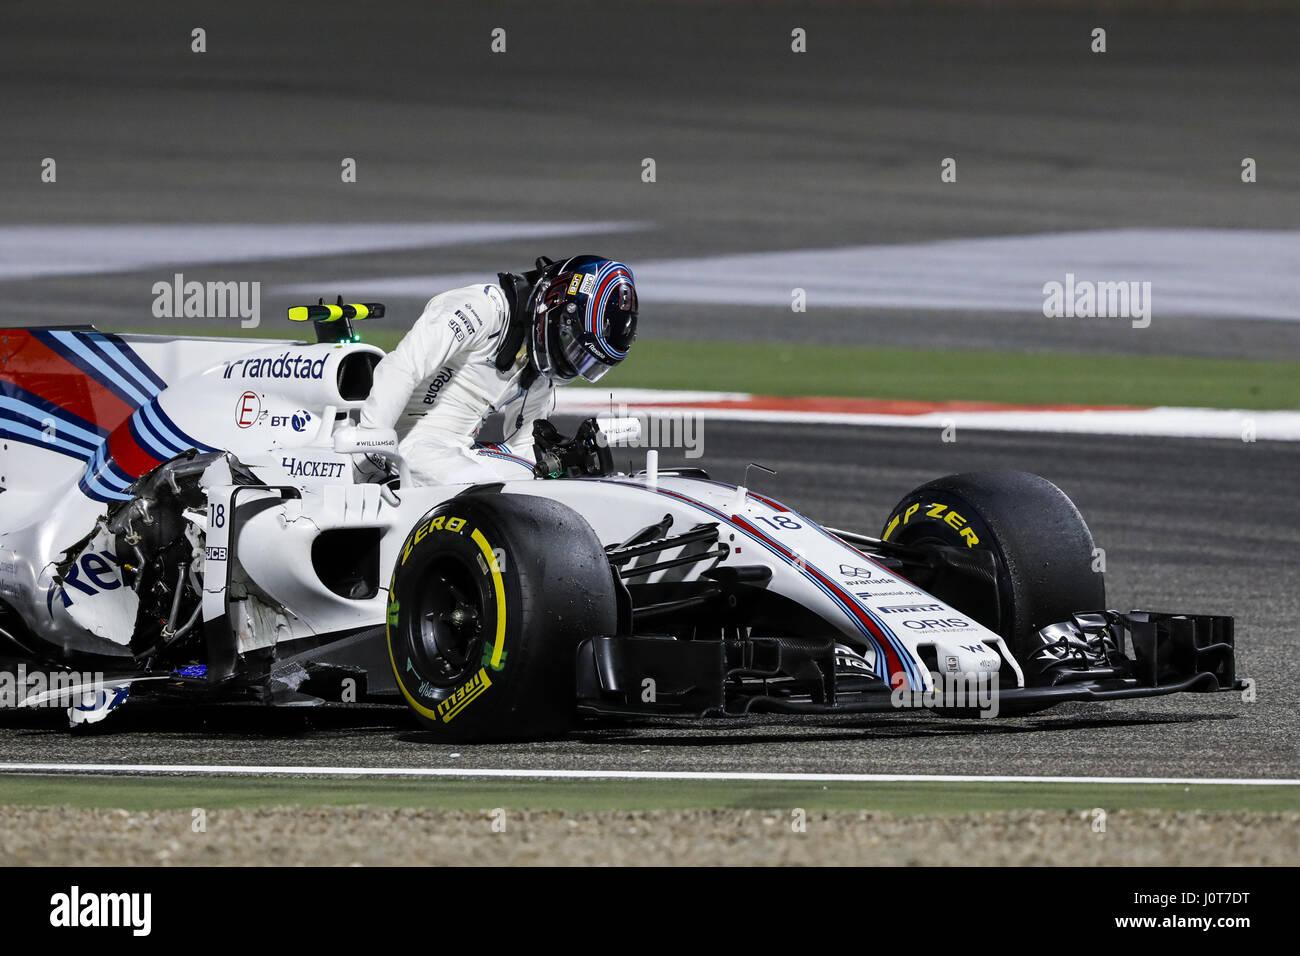 Sakhir, Bahrain. Xvi Apr, 2017. Motorsports: FIA Formula One World Championship 2017, il Gran Premio del Bahrain, Foto Stock